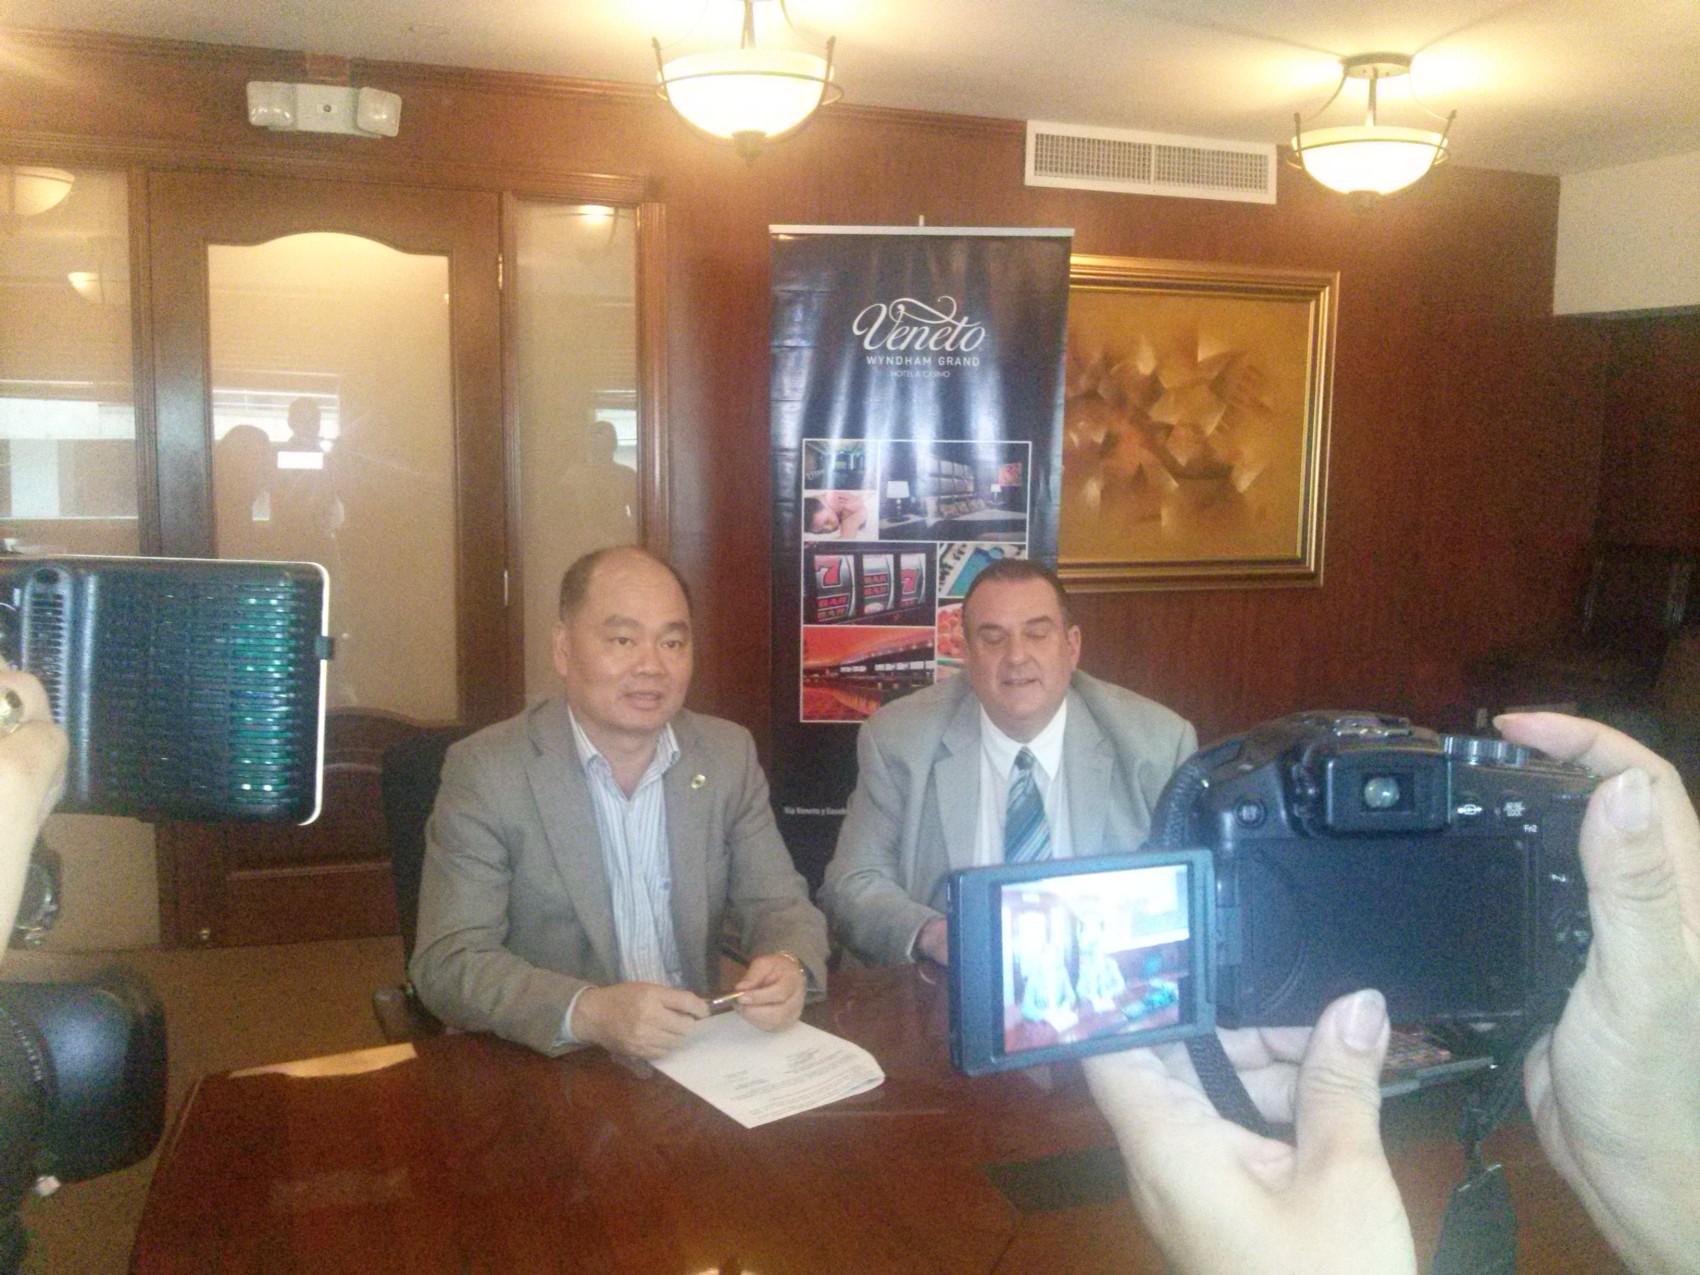 Hotel Veneto赞助并参与2015巴拿马华人新春年会